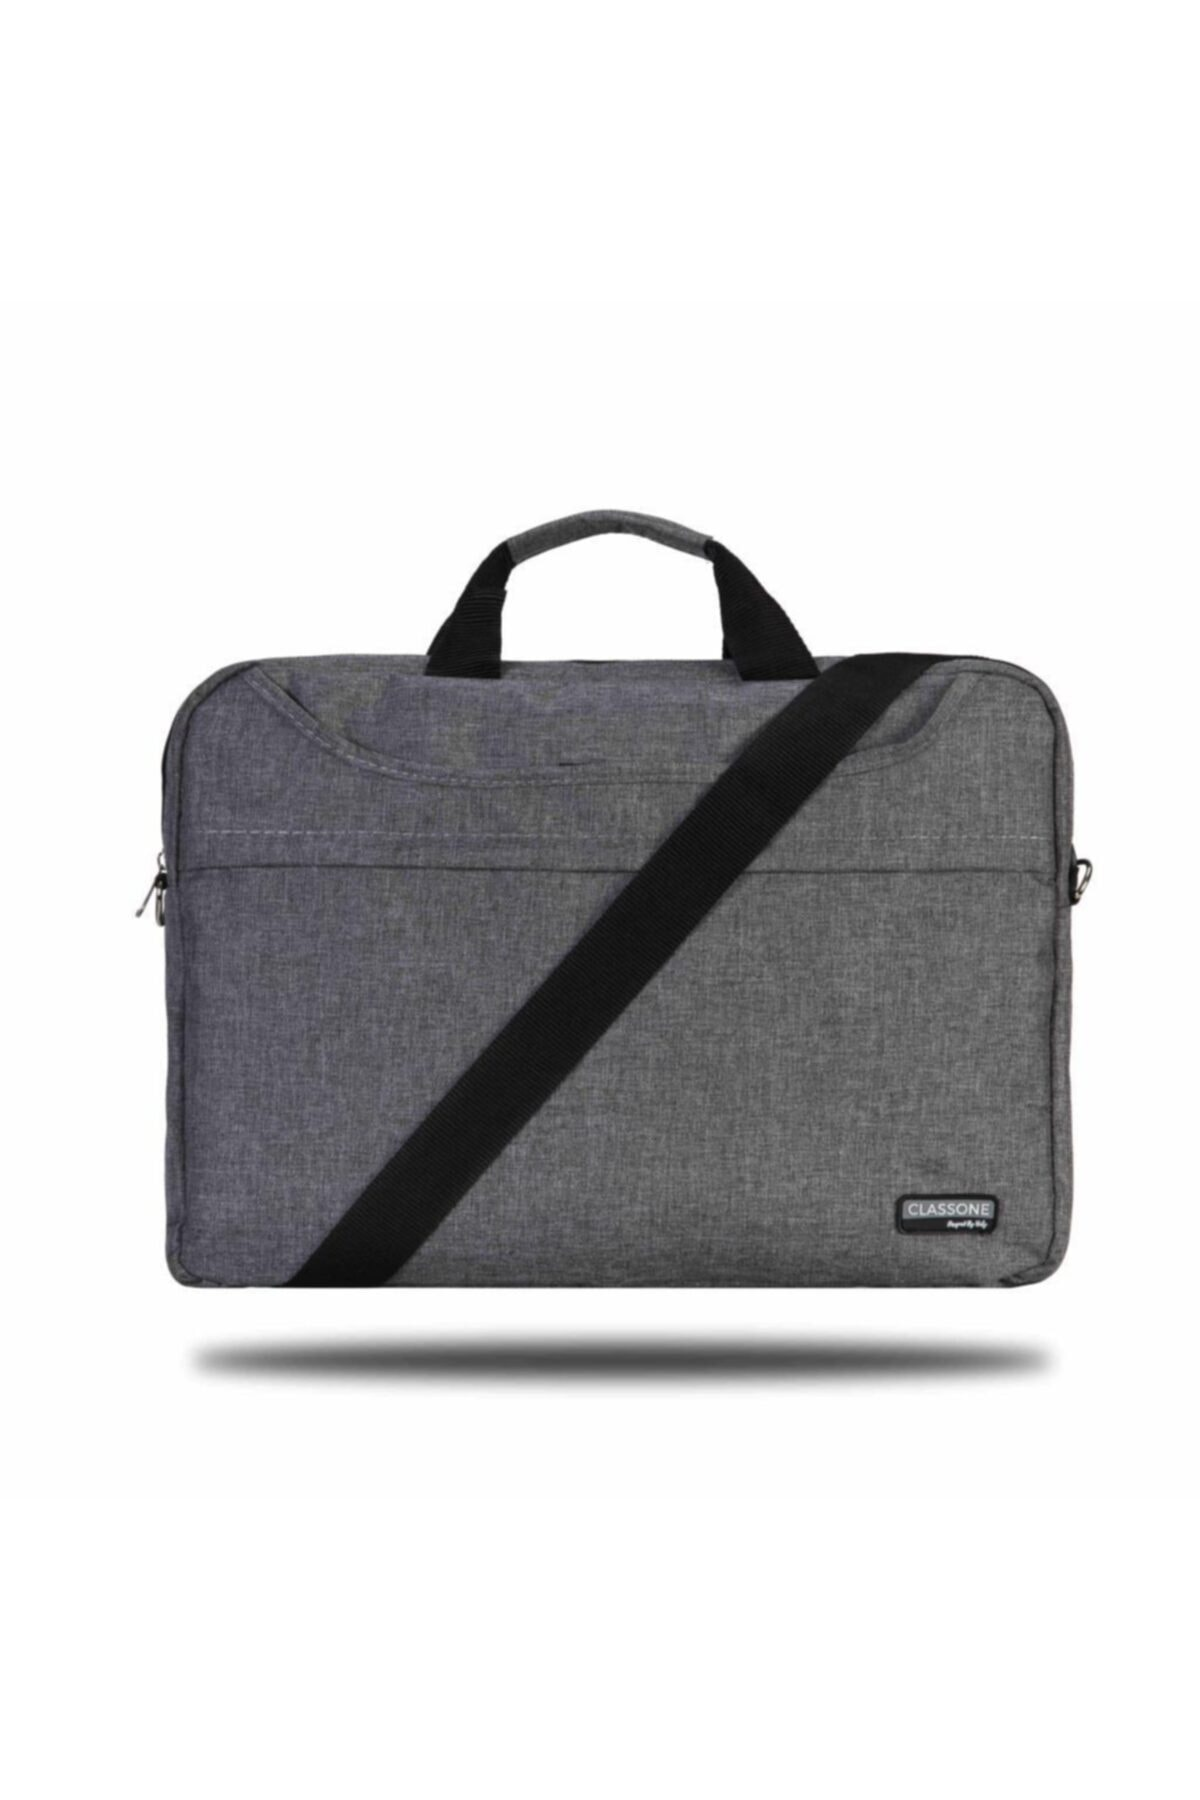 Classone TL2564 15,6 inç uyumlu Laptop Notebook El Çantası 1